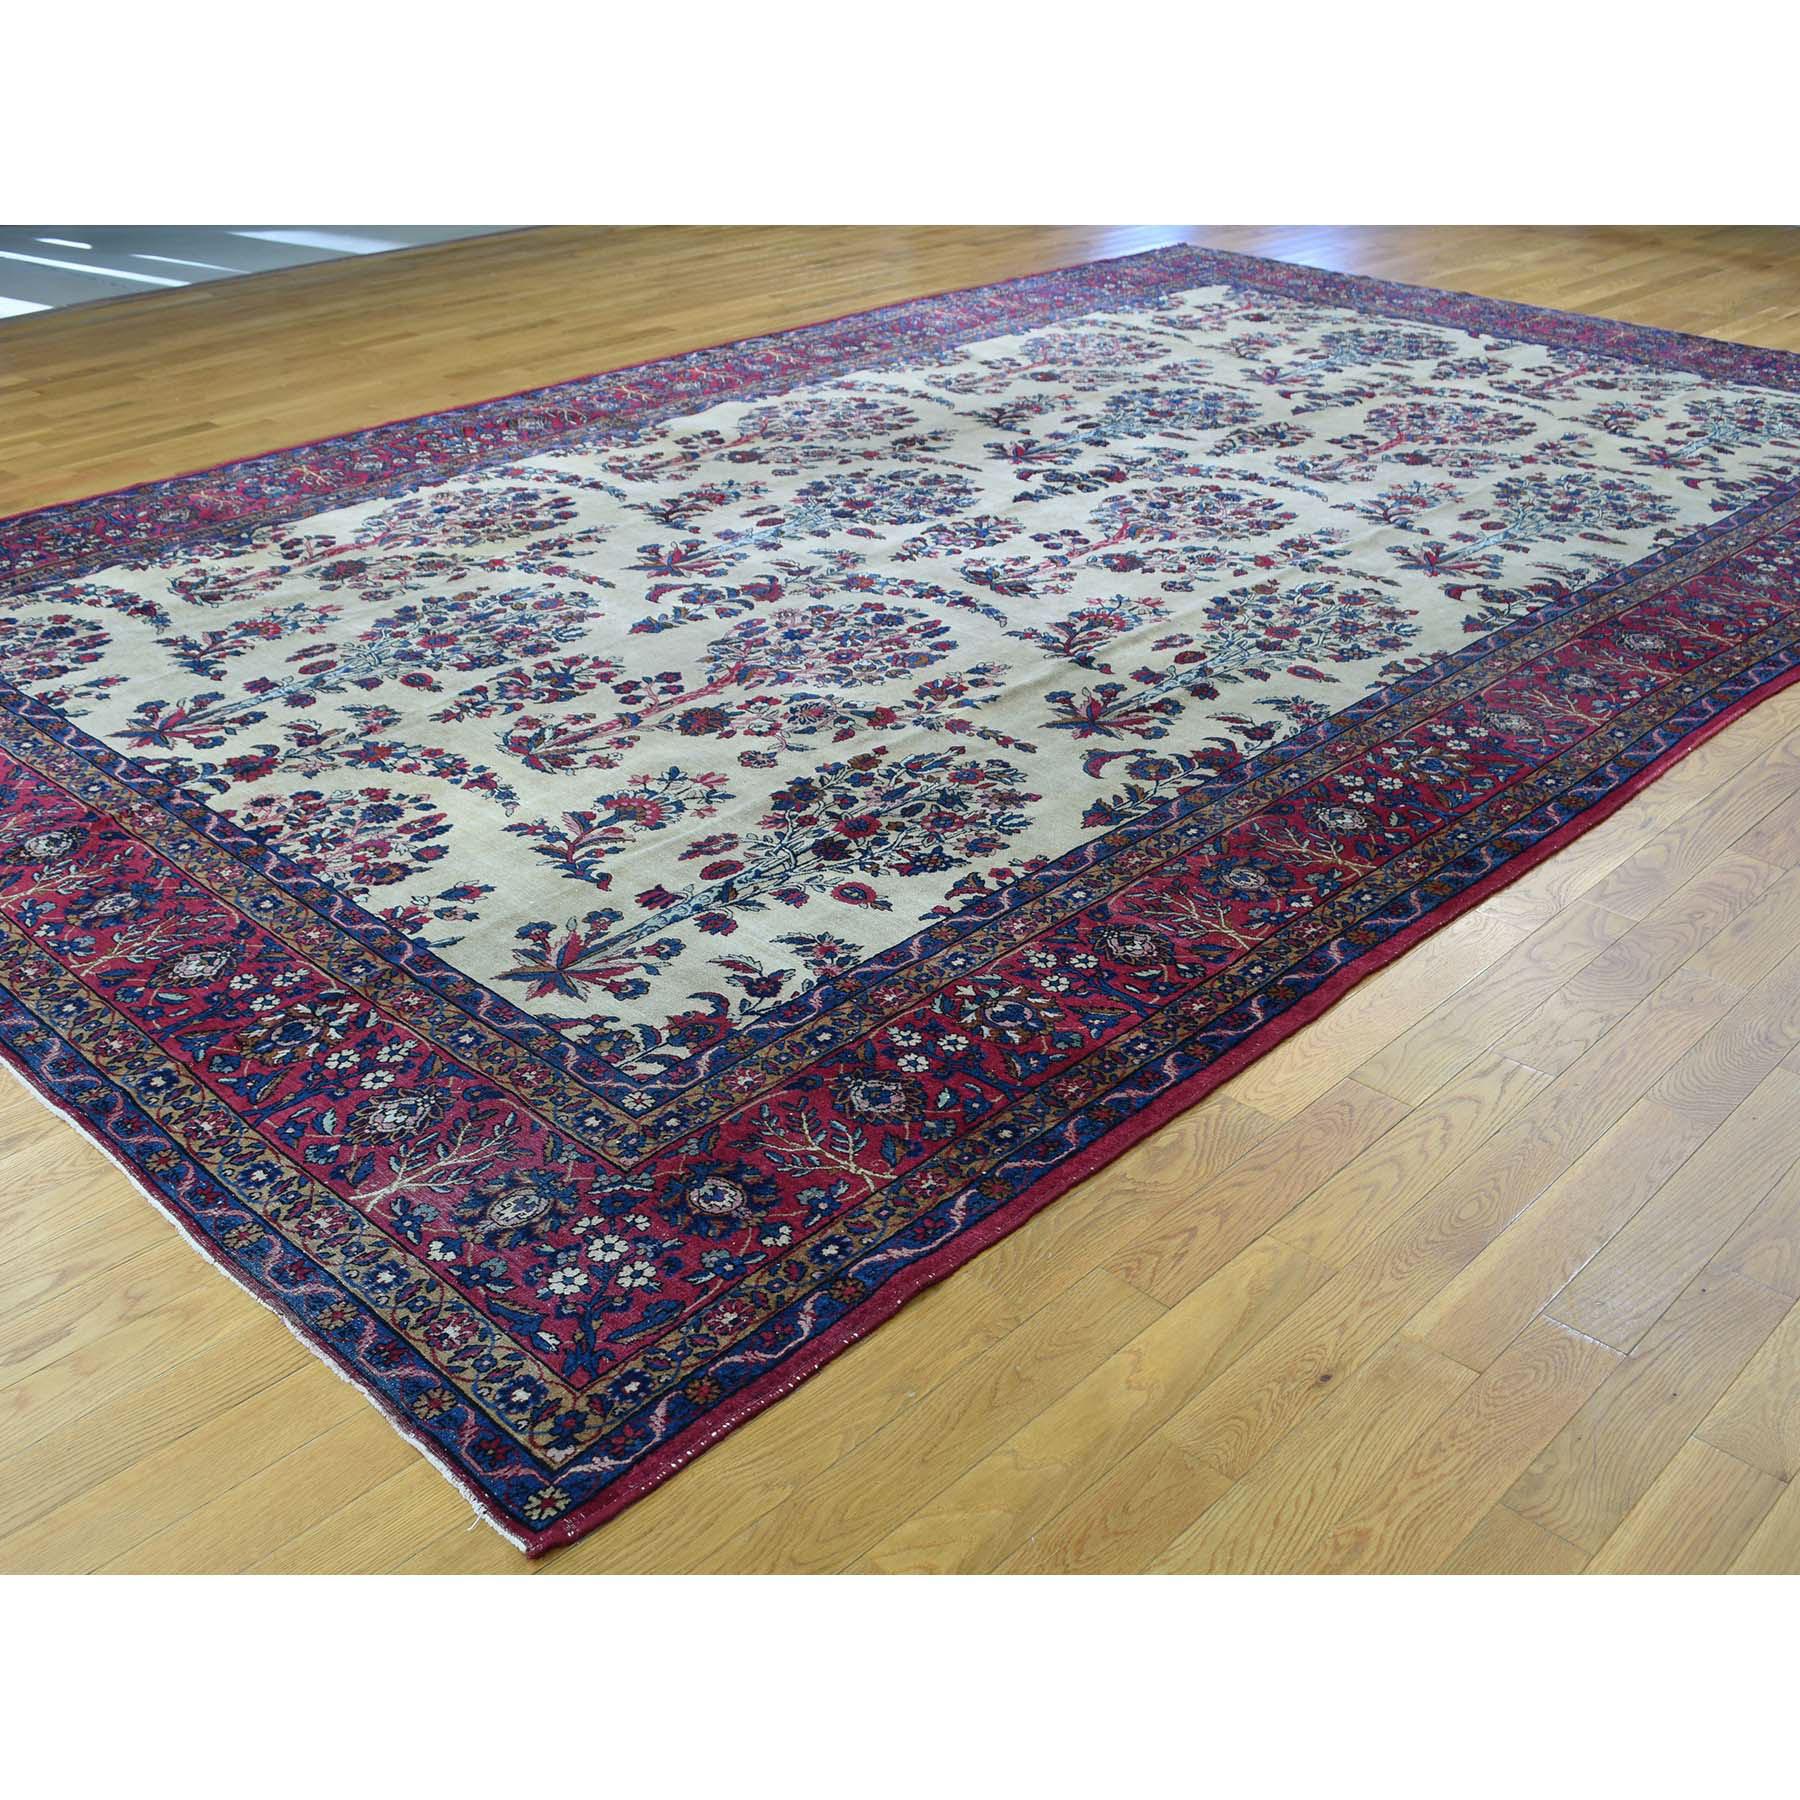 9-9 x15-8  Handmade Gallery Size Antique Persian Kerman Even Wear Rug